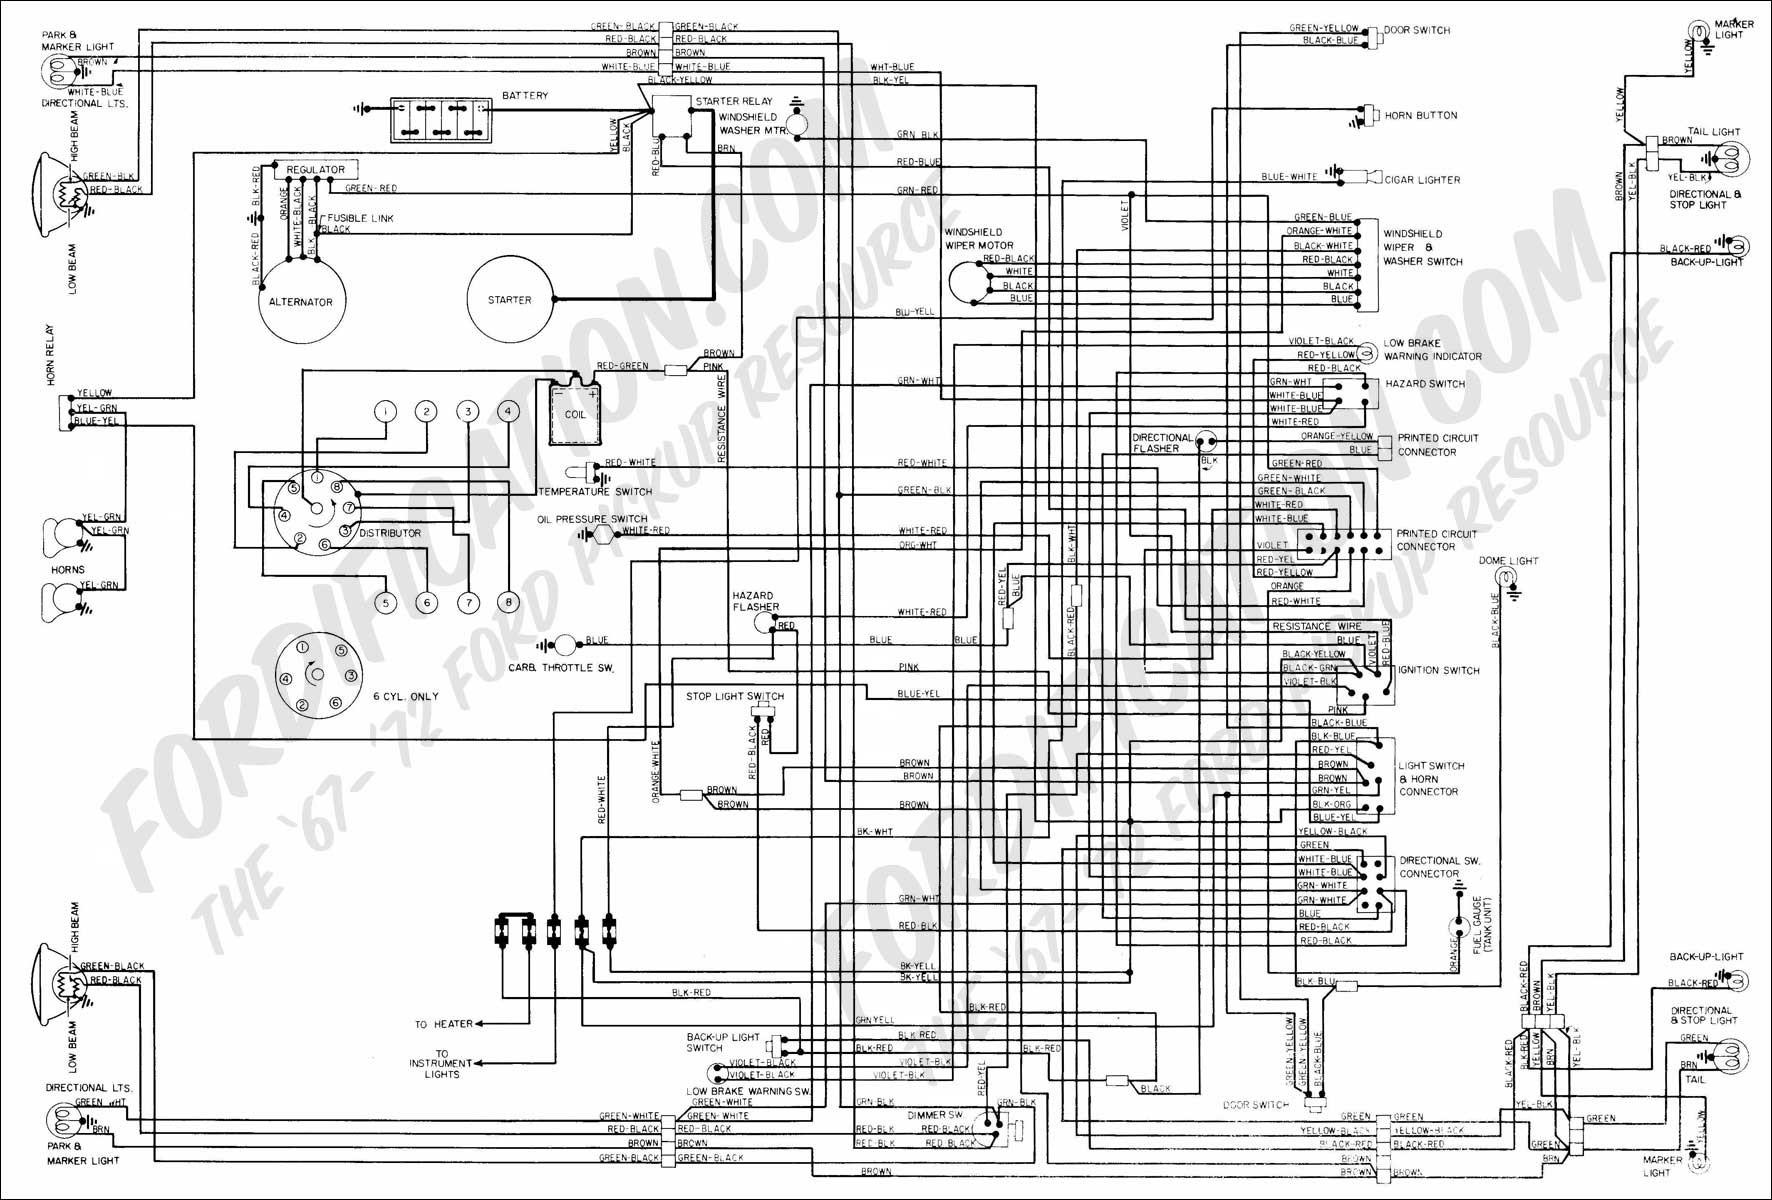 hight resolution of 2000 ford f150 v6 engine diagram 1990 ford f 150 wiring diagram wiring diagram of 2000